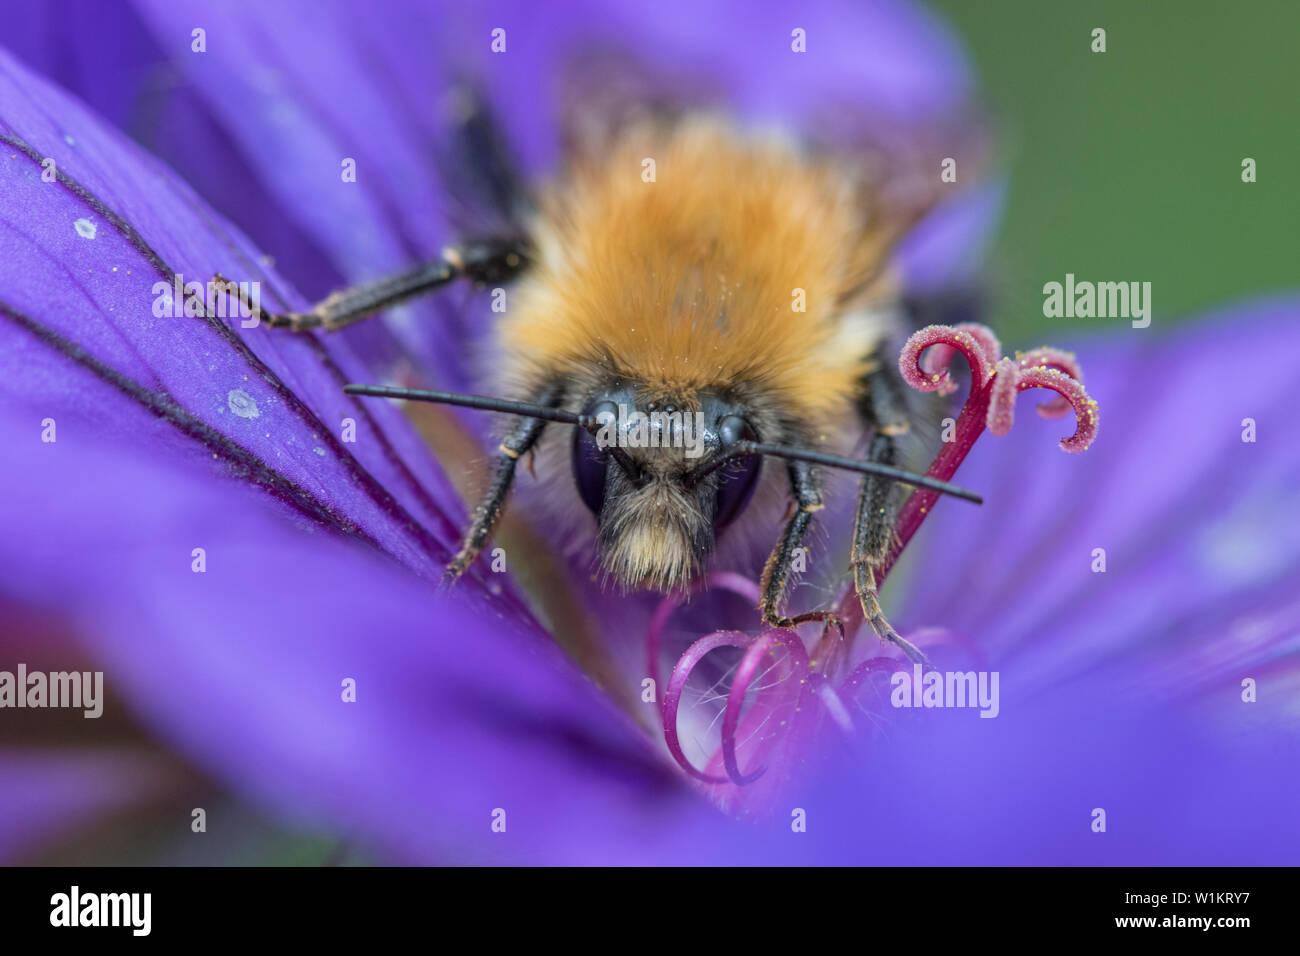 Bumble Bee on Geranium, England, UK - Stock Image